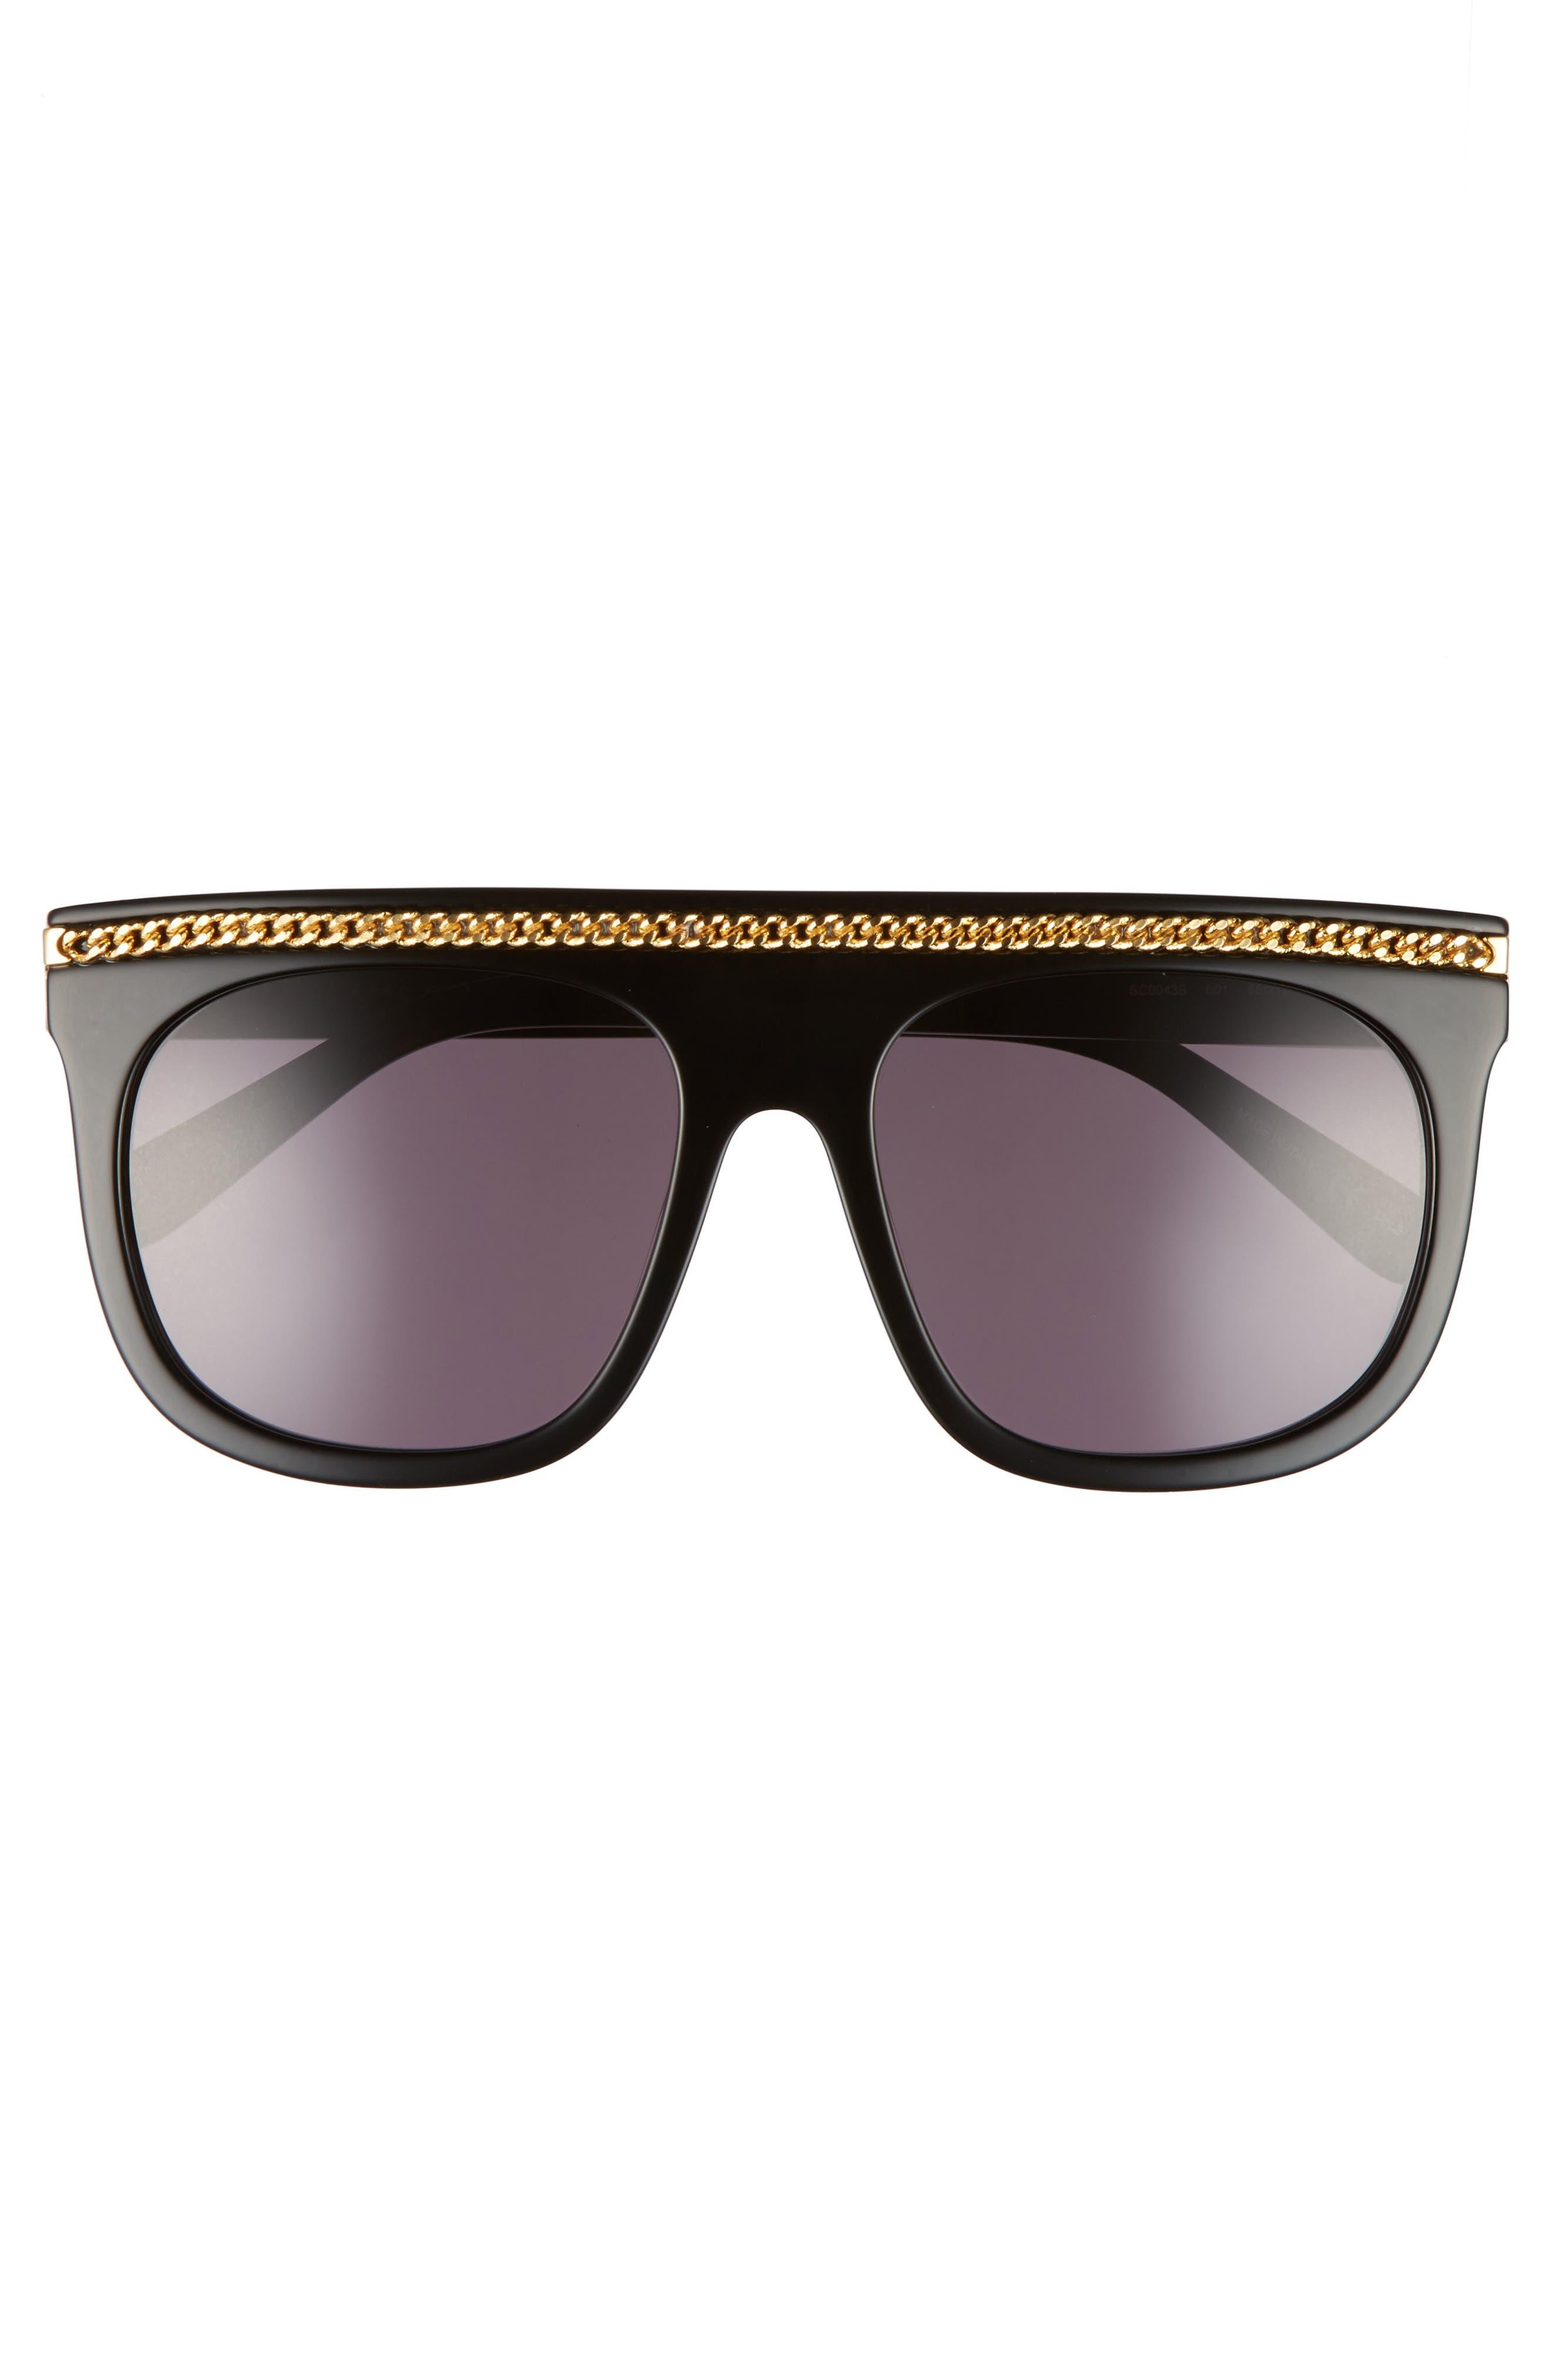 55mm Flat Top Sunglasses,                             Alternate thumbnail 3, color,                             001